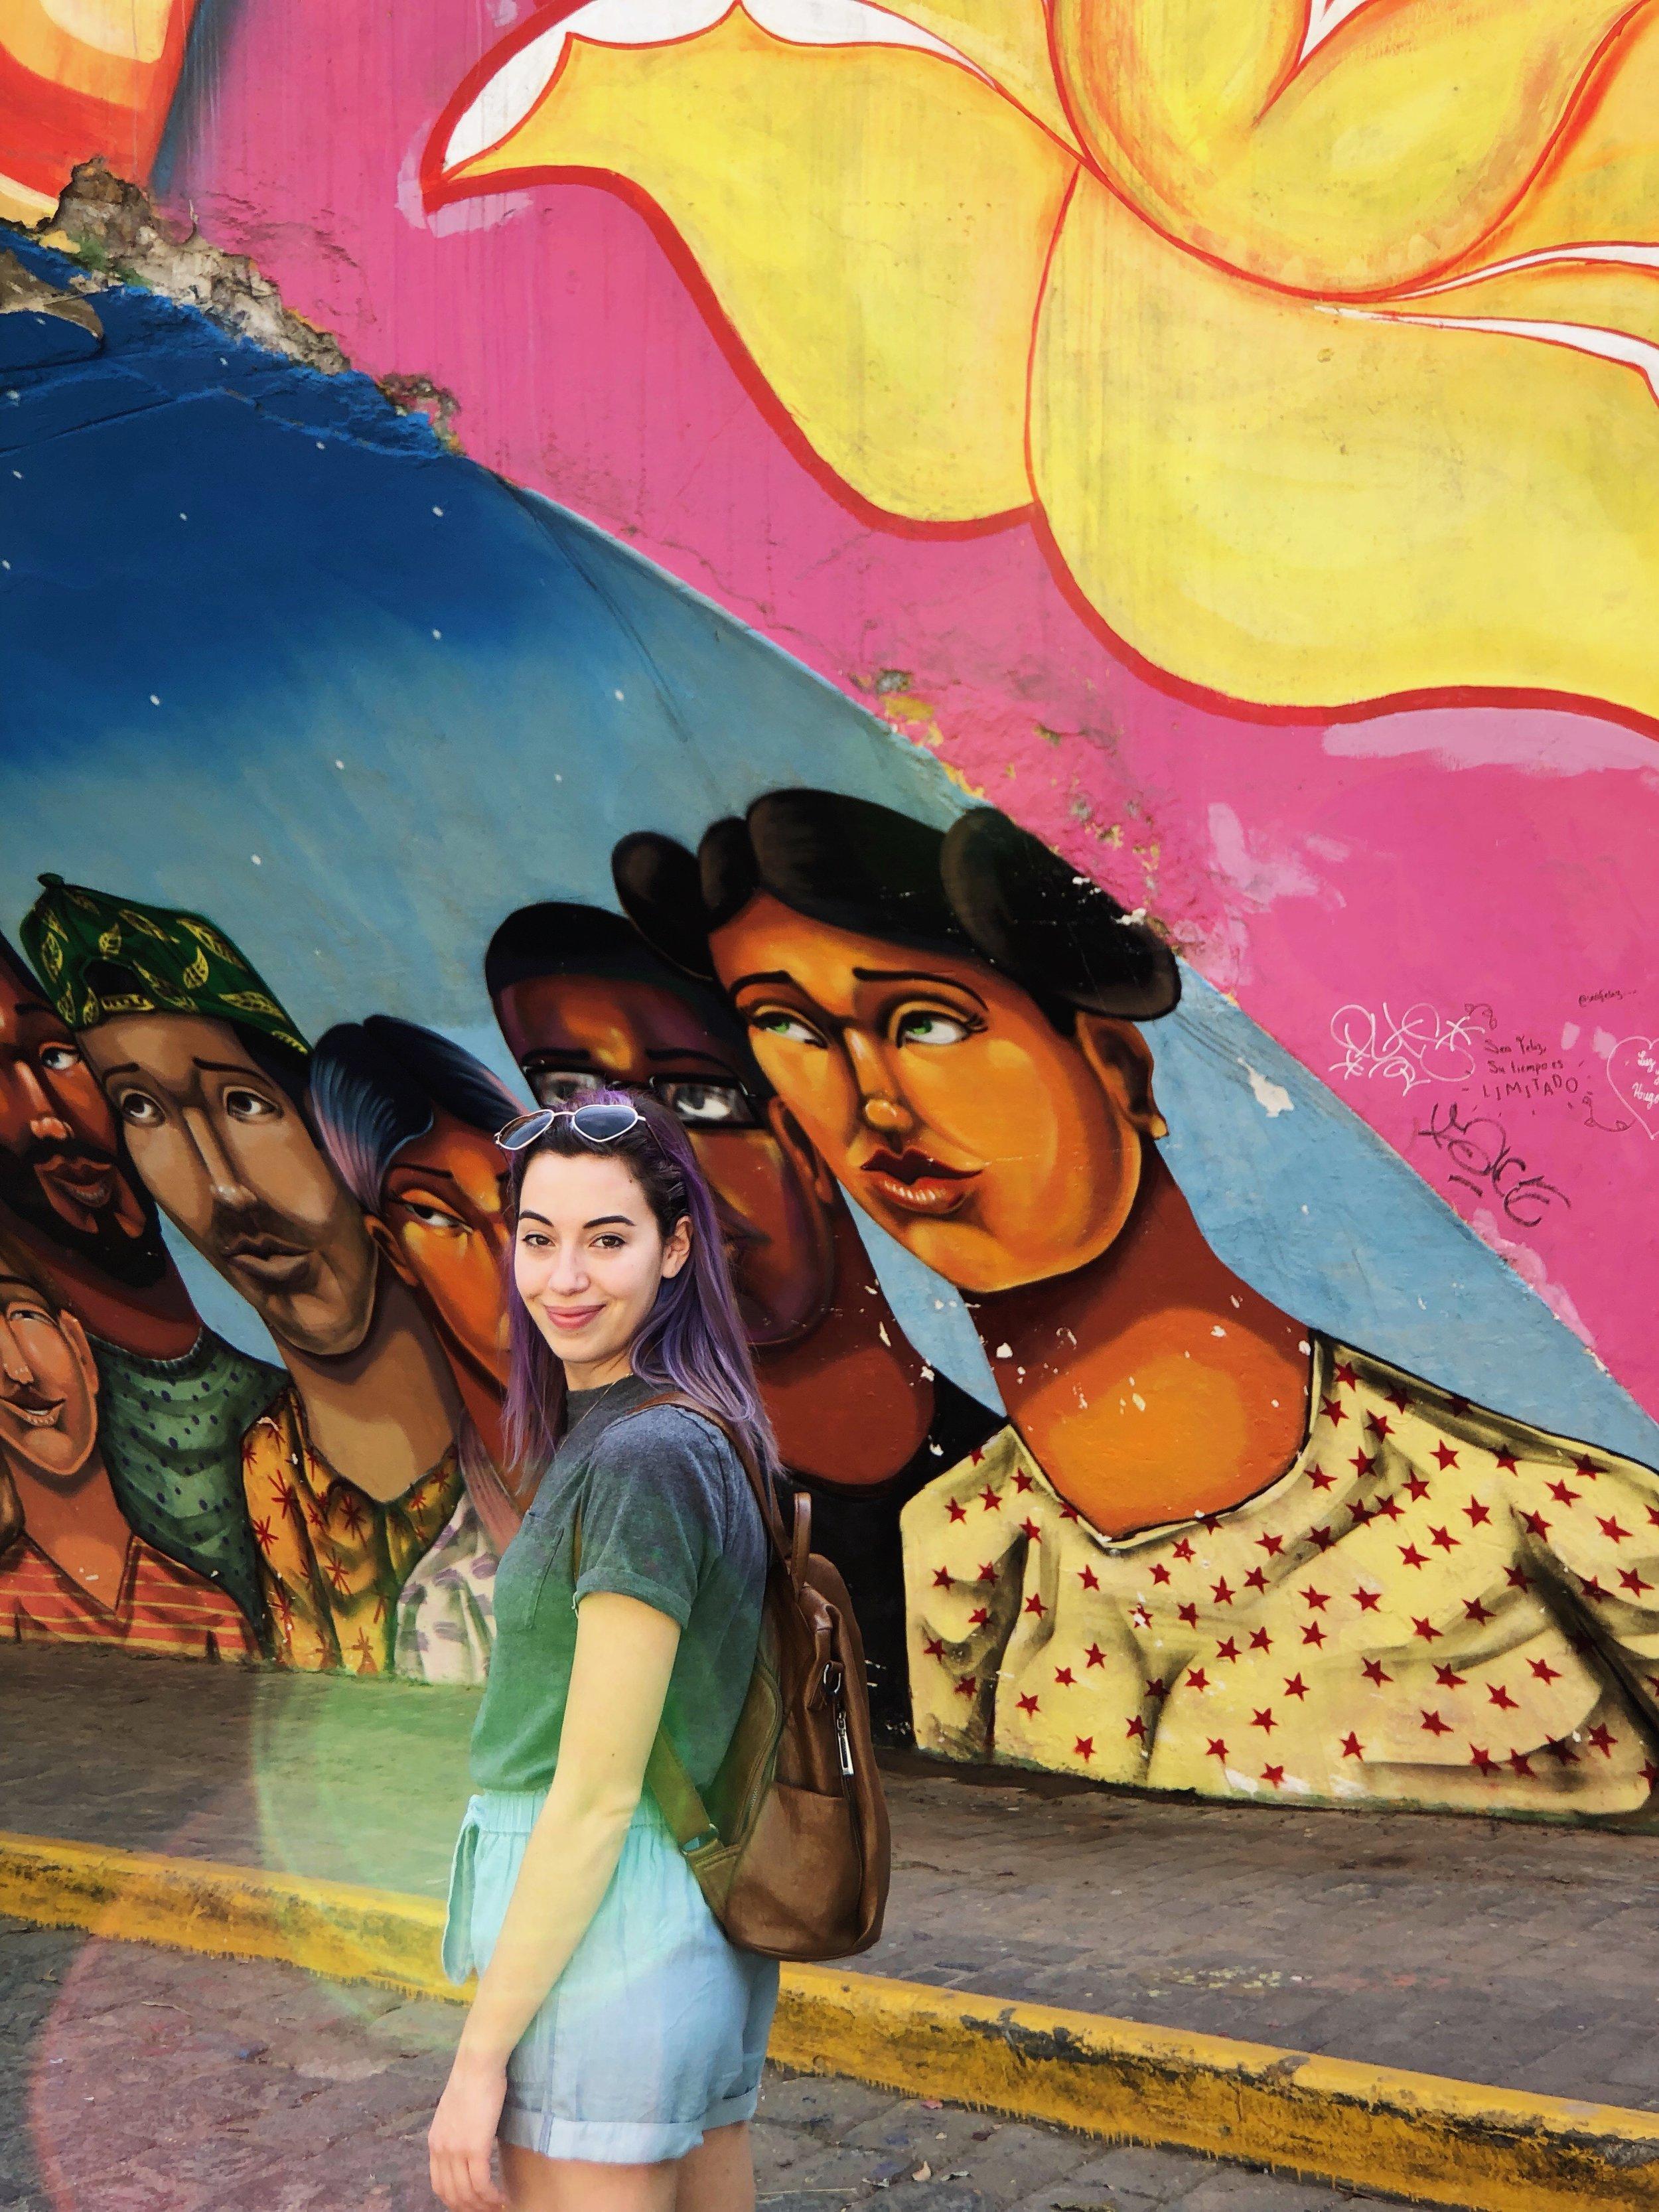 Barranco-lima-peru-travel-tips-graffiti-south-america-bridge-of-sighs